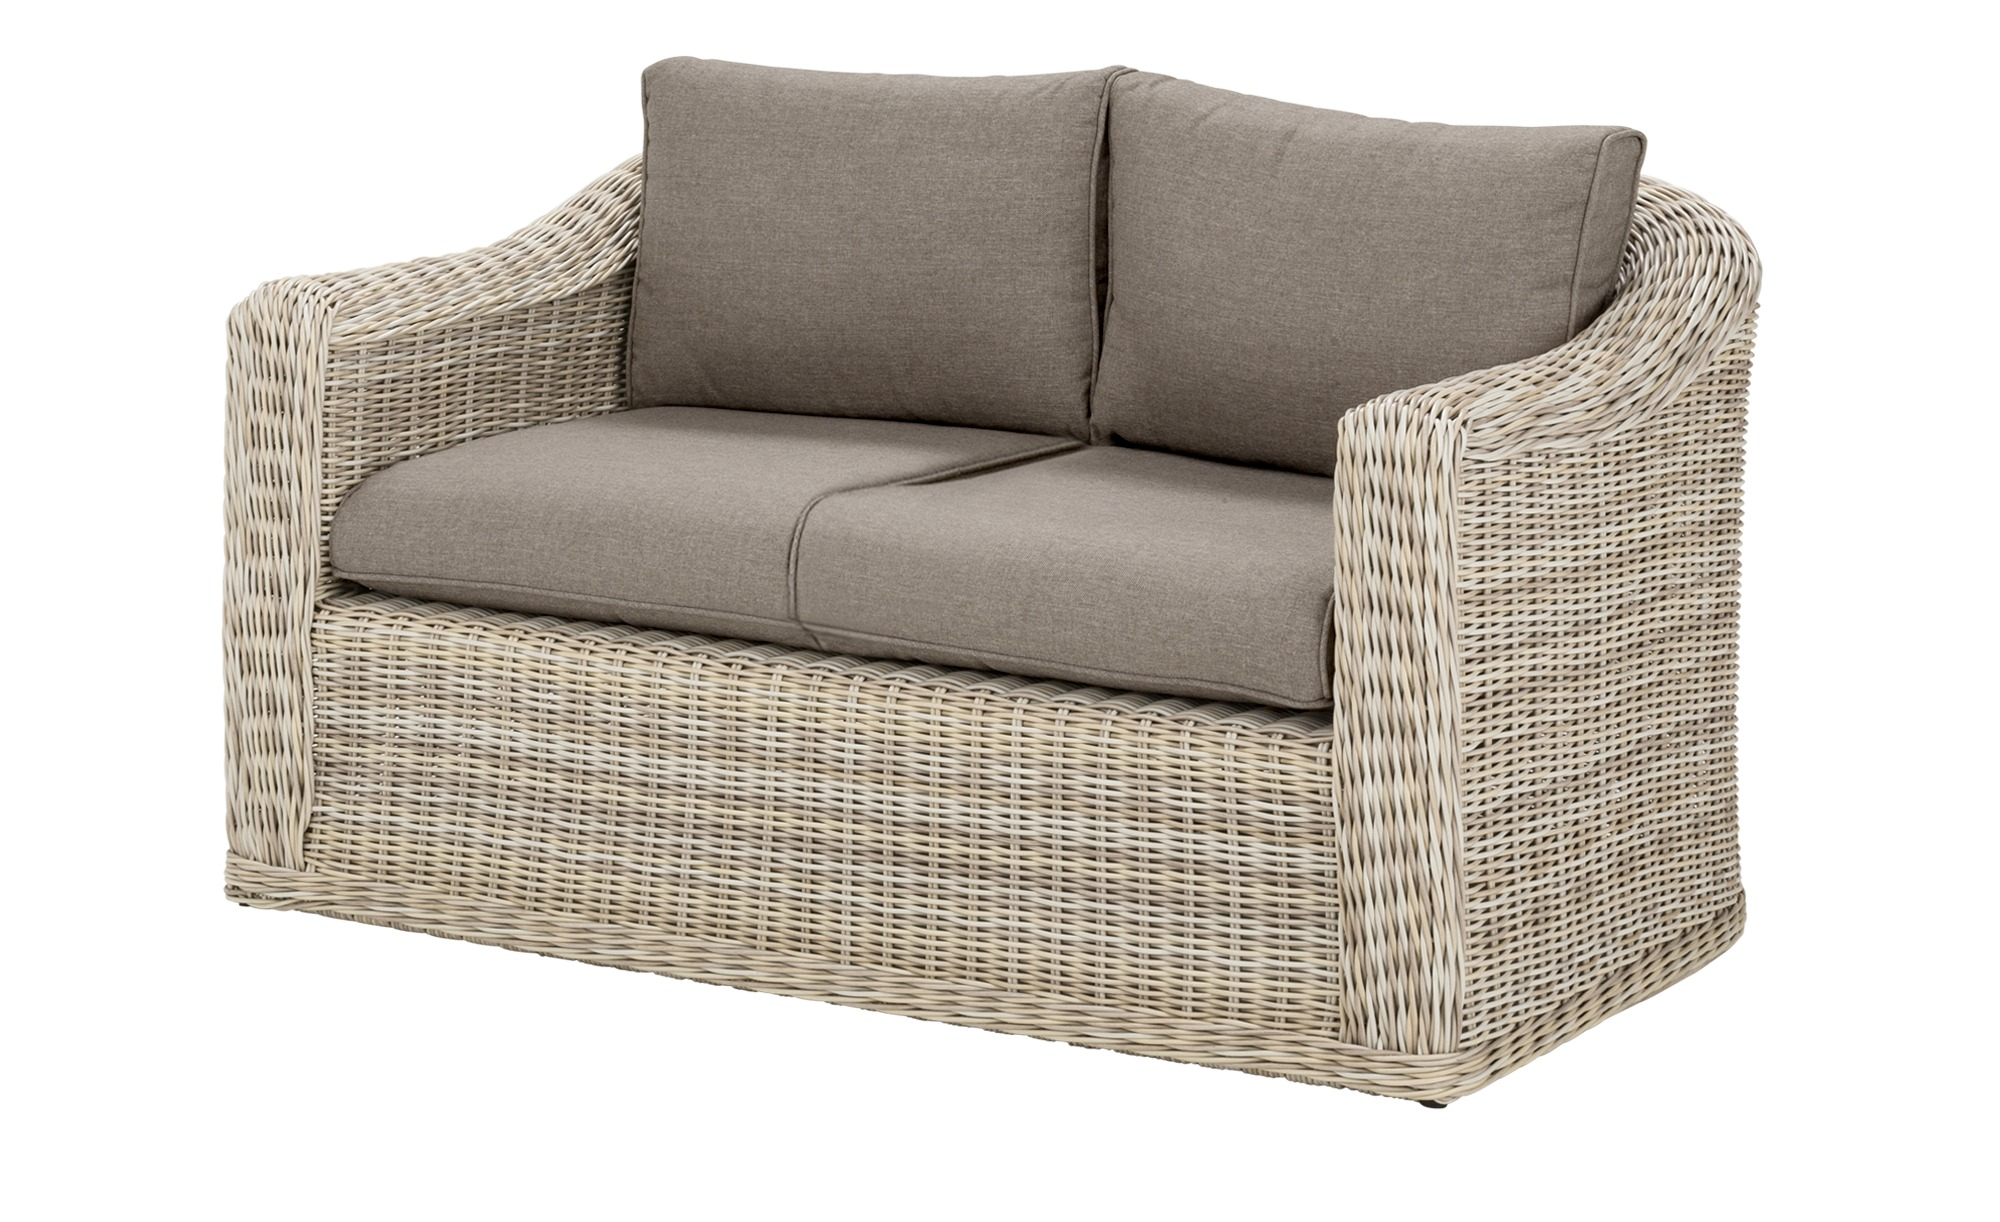 Full Size of Garten Couch 2 Sitzer Gartensofa Rattan Aluminium Sofa Ausziehbar A Casa Mia Sylt 1 136 Cm Mbel Hffner 120x200 Bett 140x200 Mit Bettkasten 90x200 Stauraum Rc Wohnzimmer Gartensofa 2 Sitzer